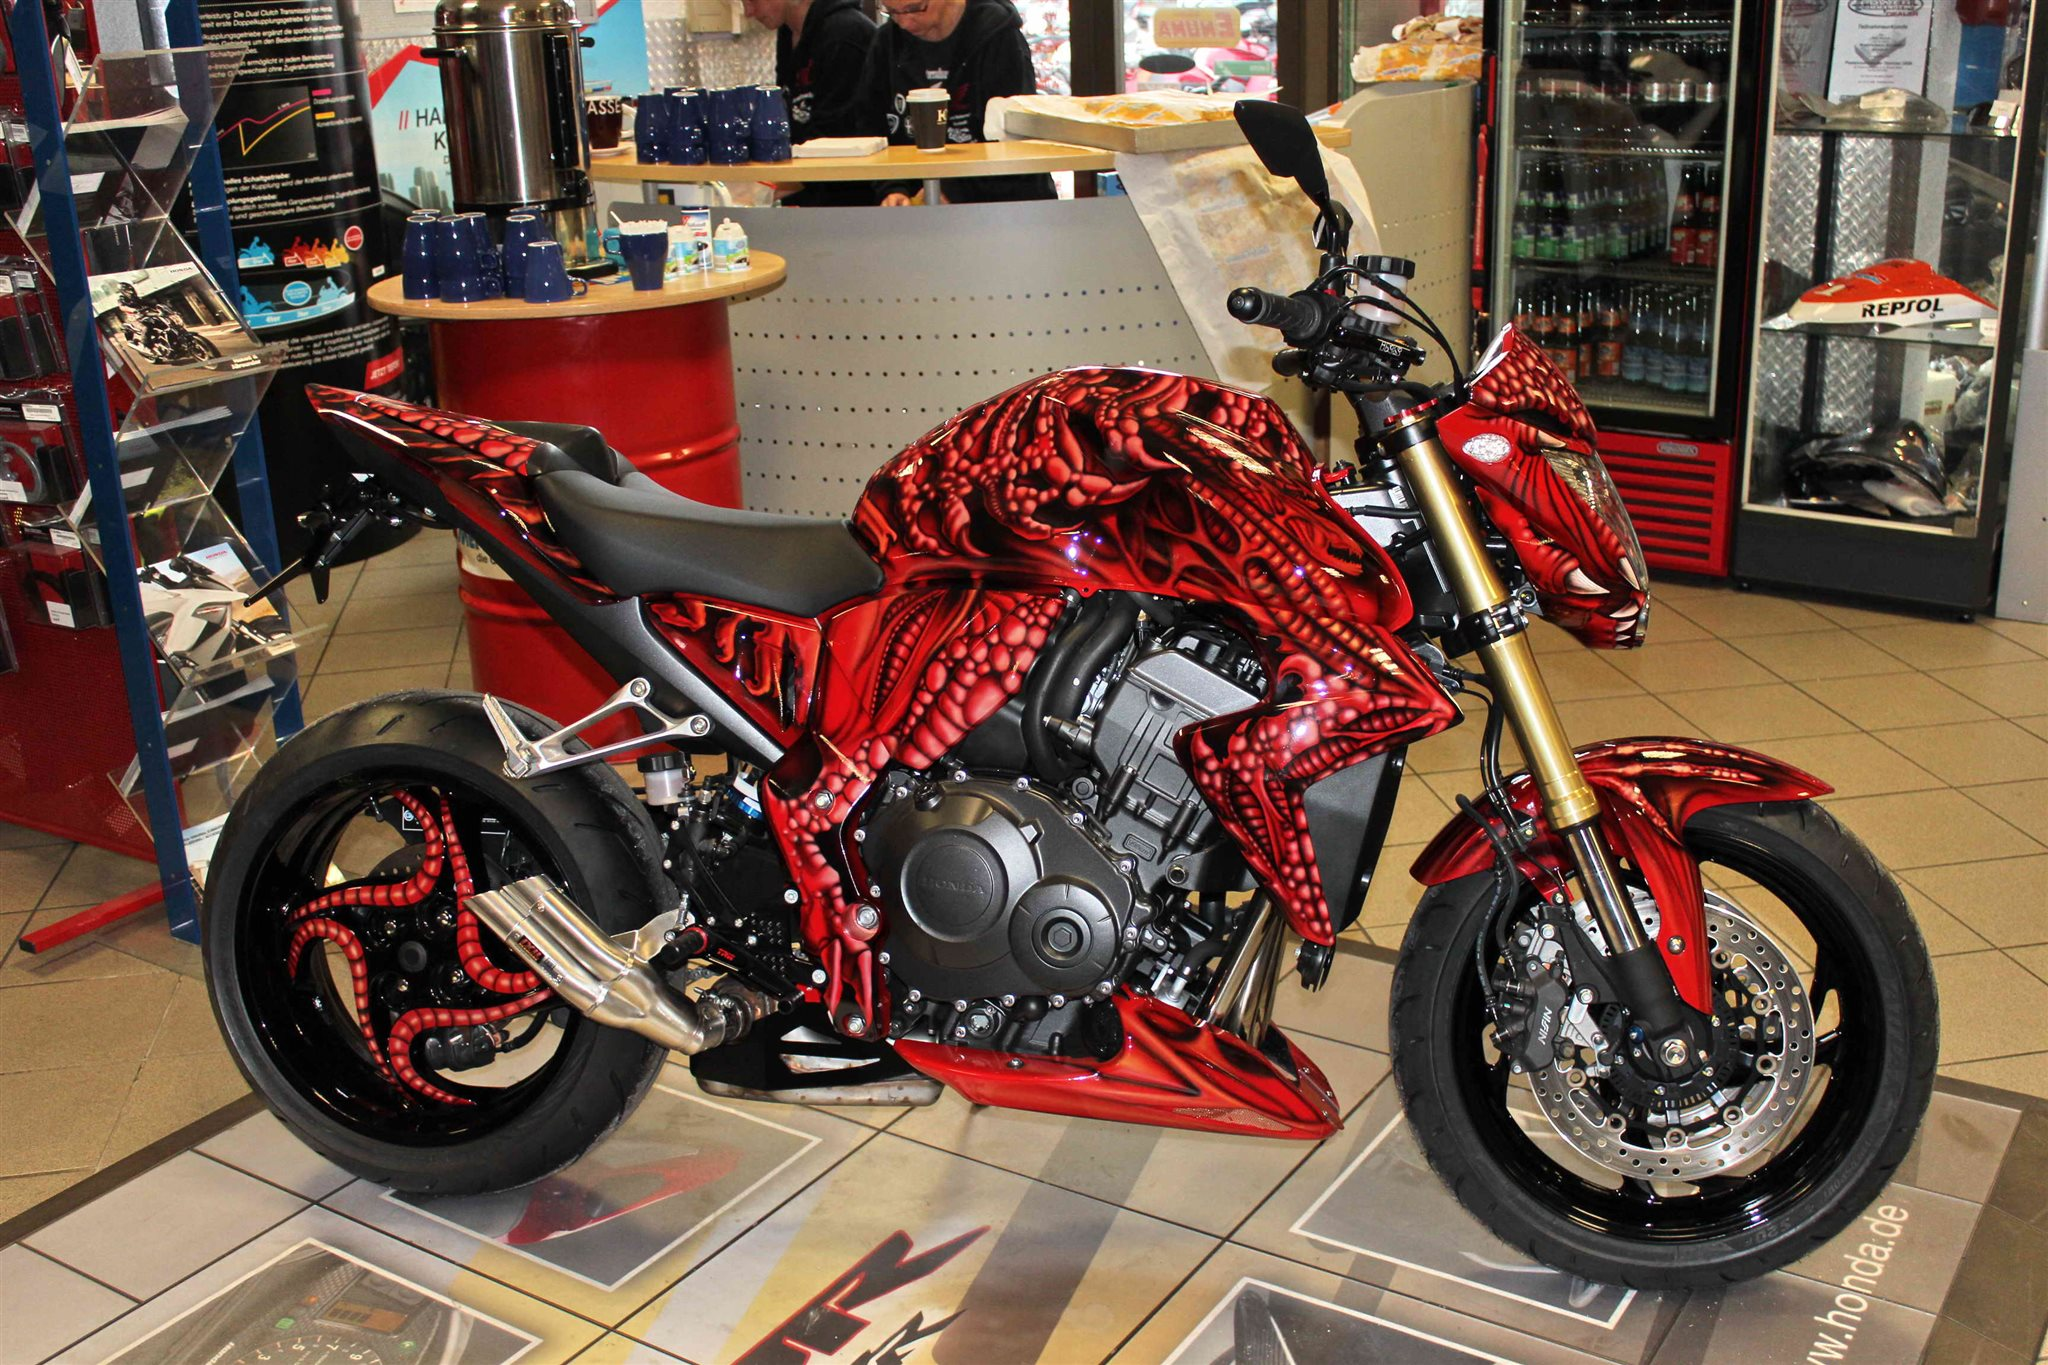 Umgebautes Motorrad Honda CB 1000 R von elec85 - 1000PS.at